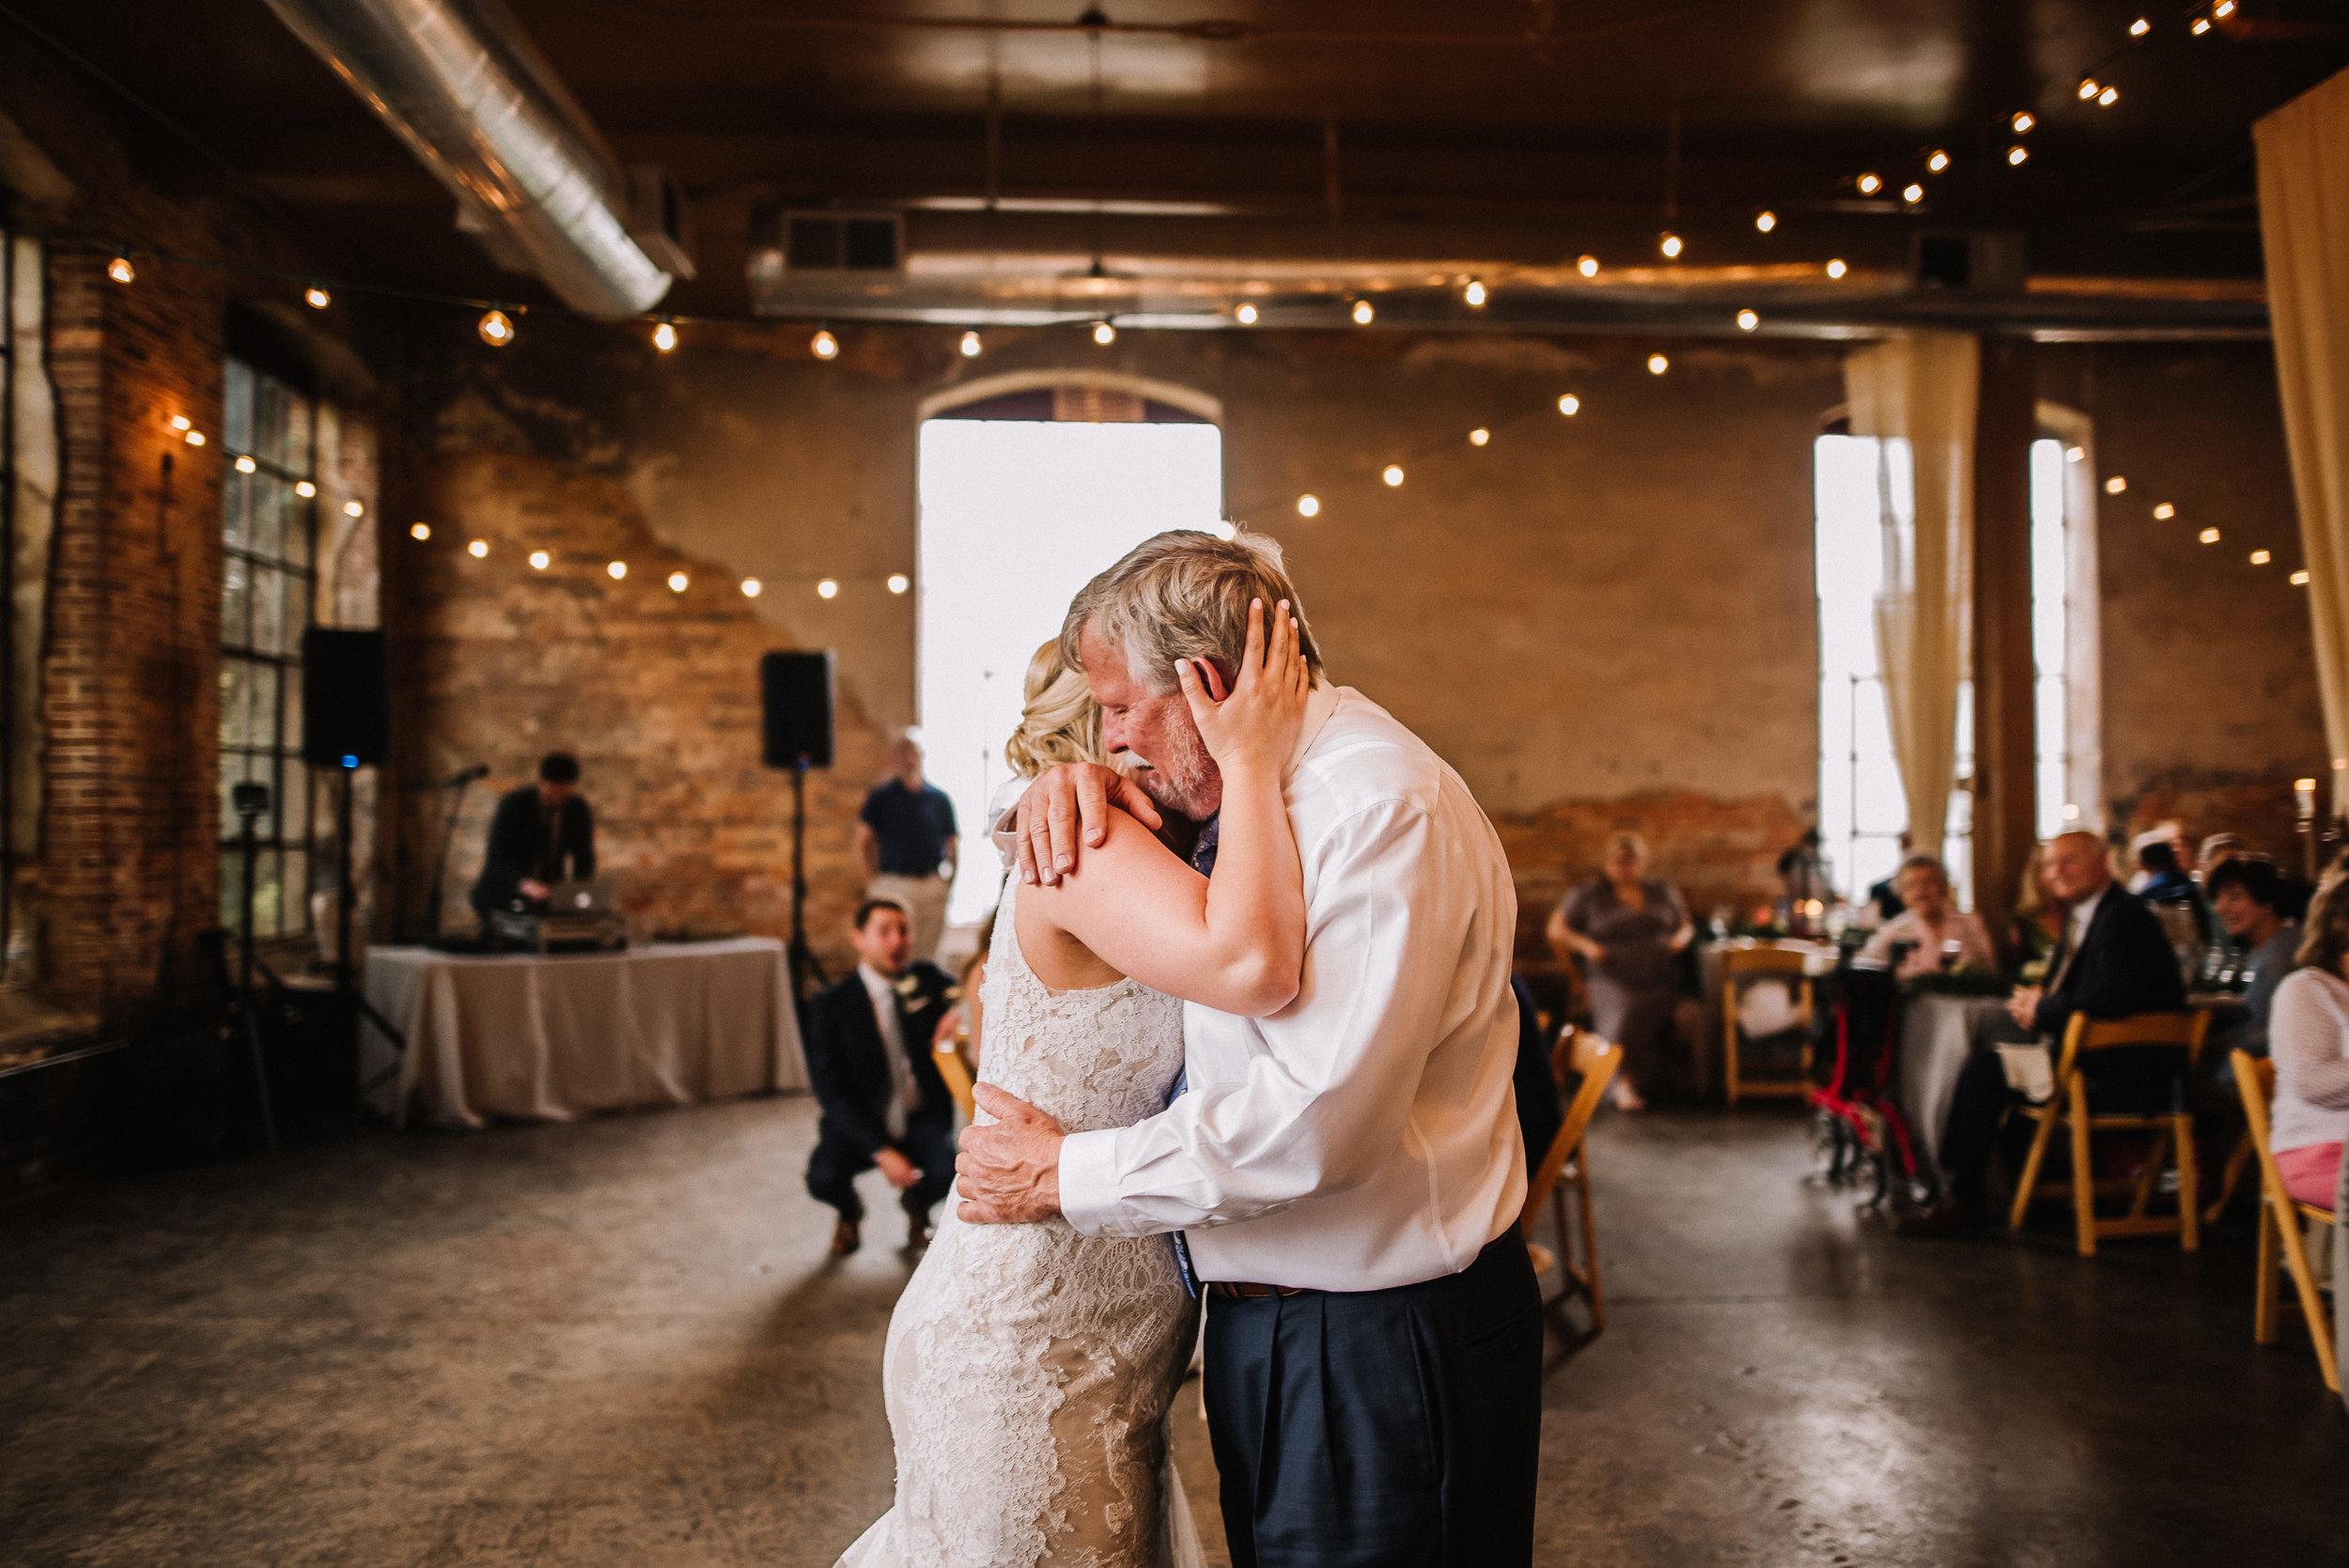 Morgan Wedding_Mill at Yellow River_Ashley Benham Photography-1007.jpg